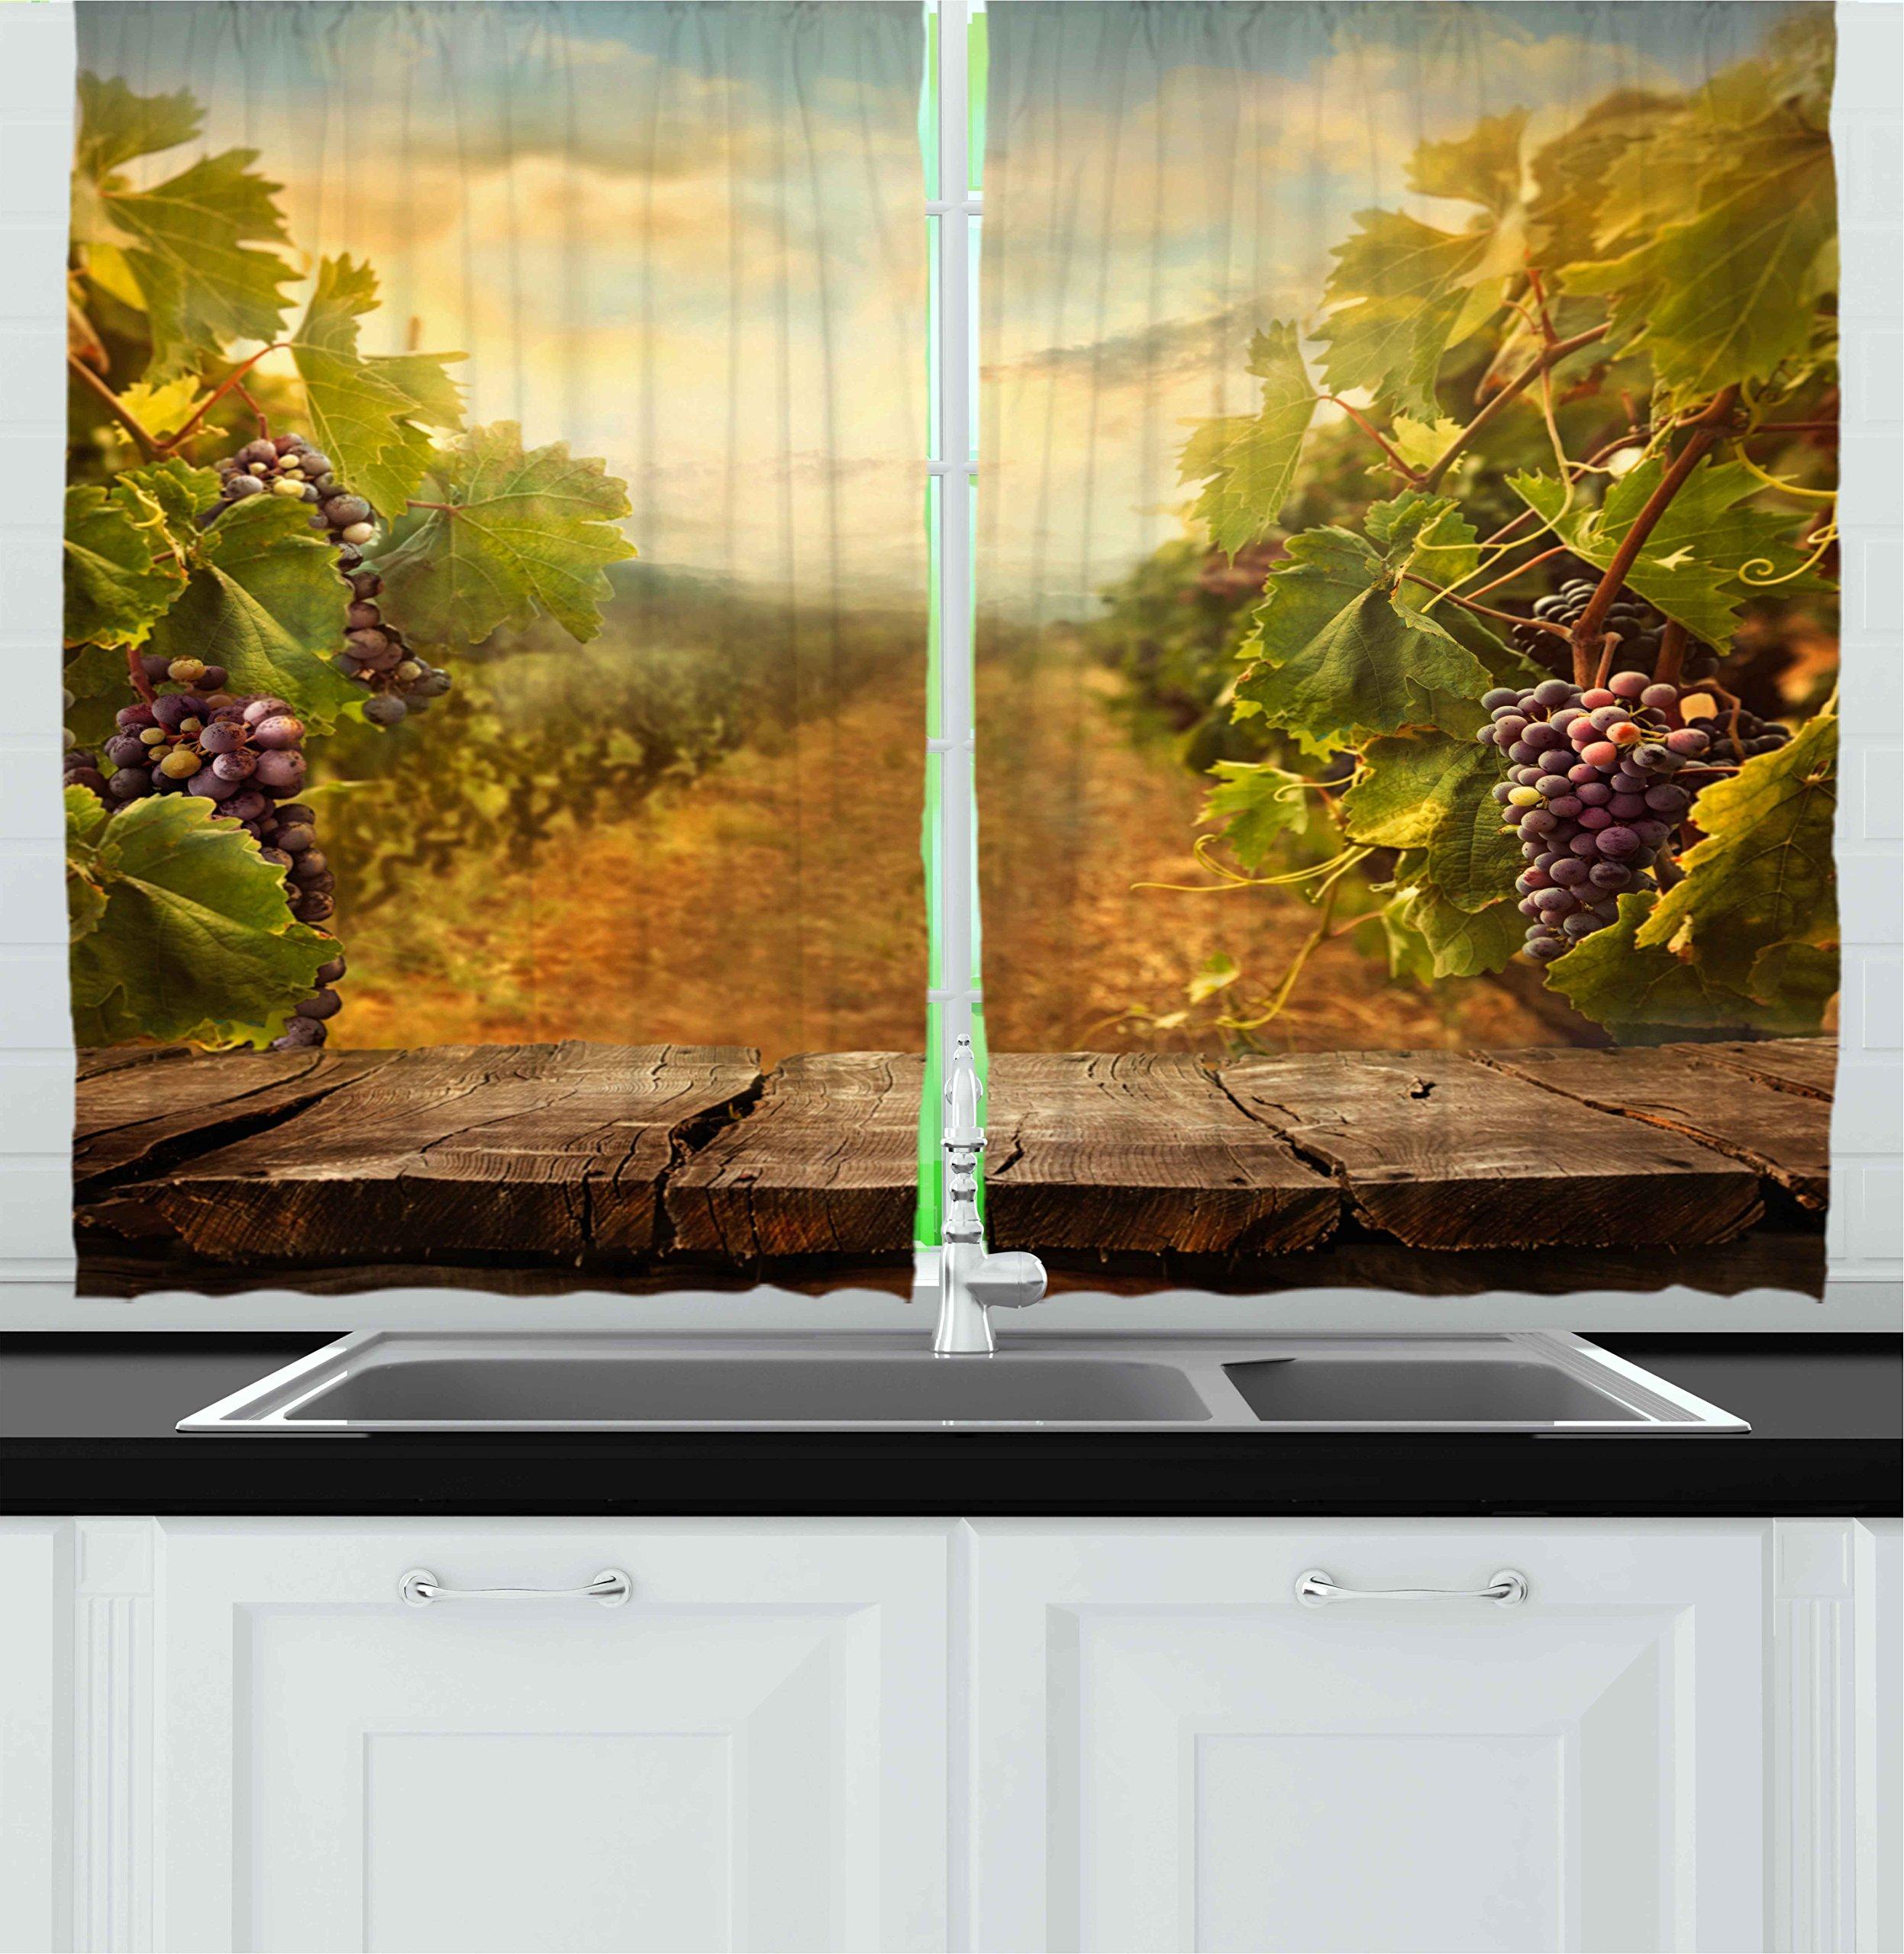 Winery Kitchen Decor: Amazon.com